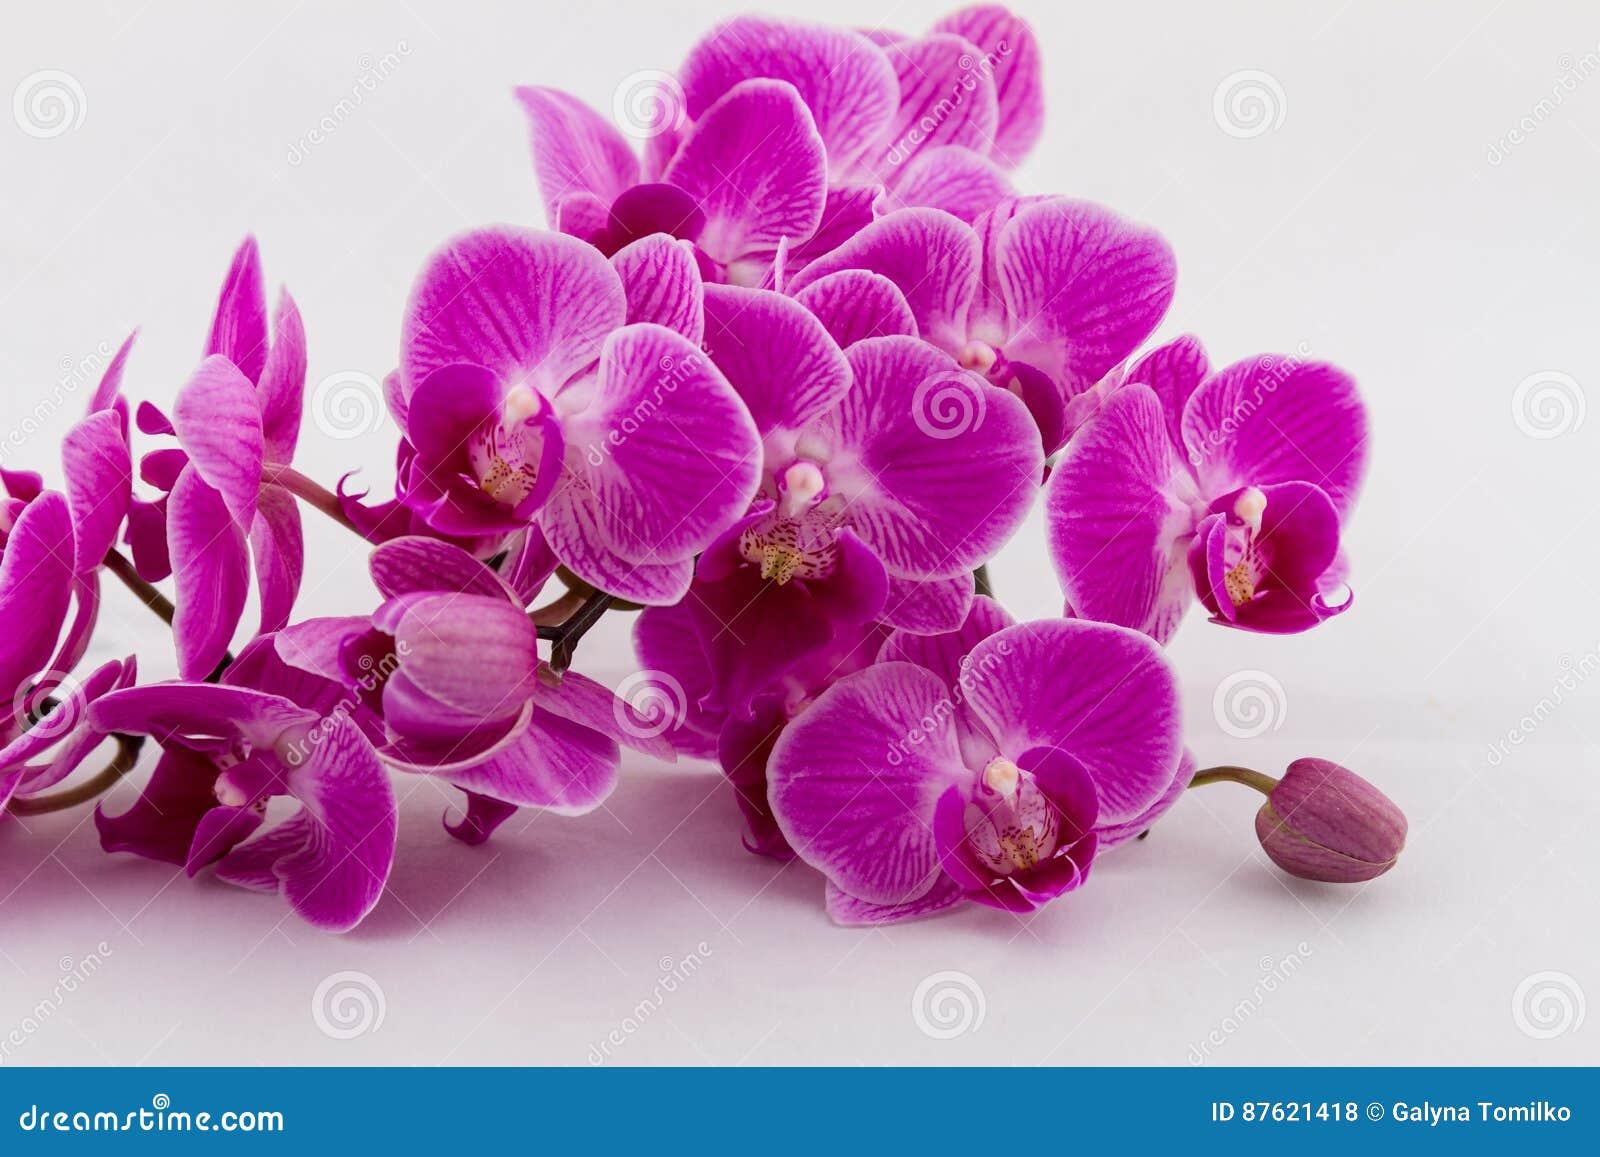 Flowering branch of Orchid phalaenopsis